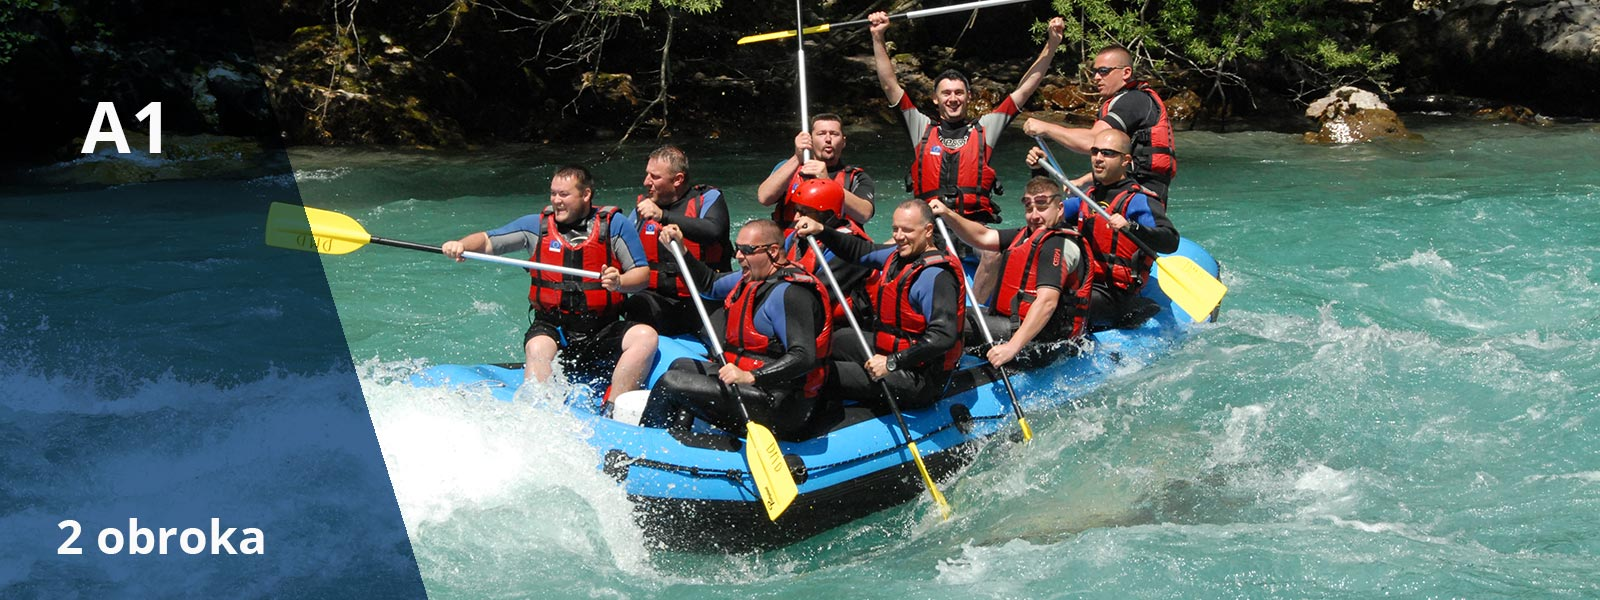 rafting aranzman Adrenalin-1